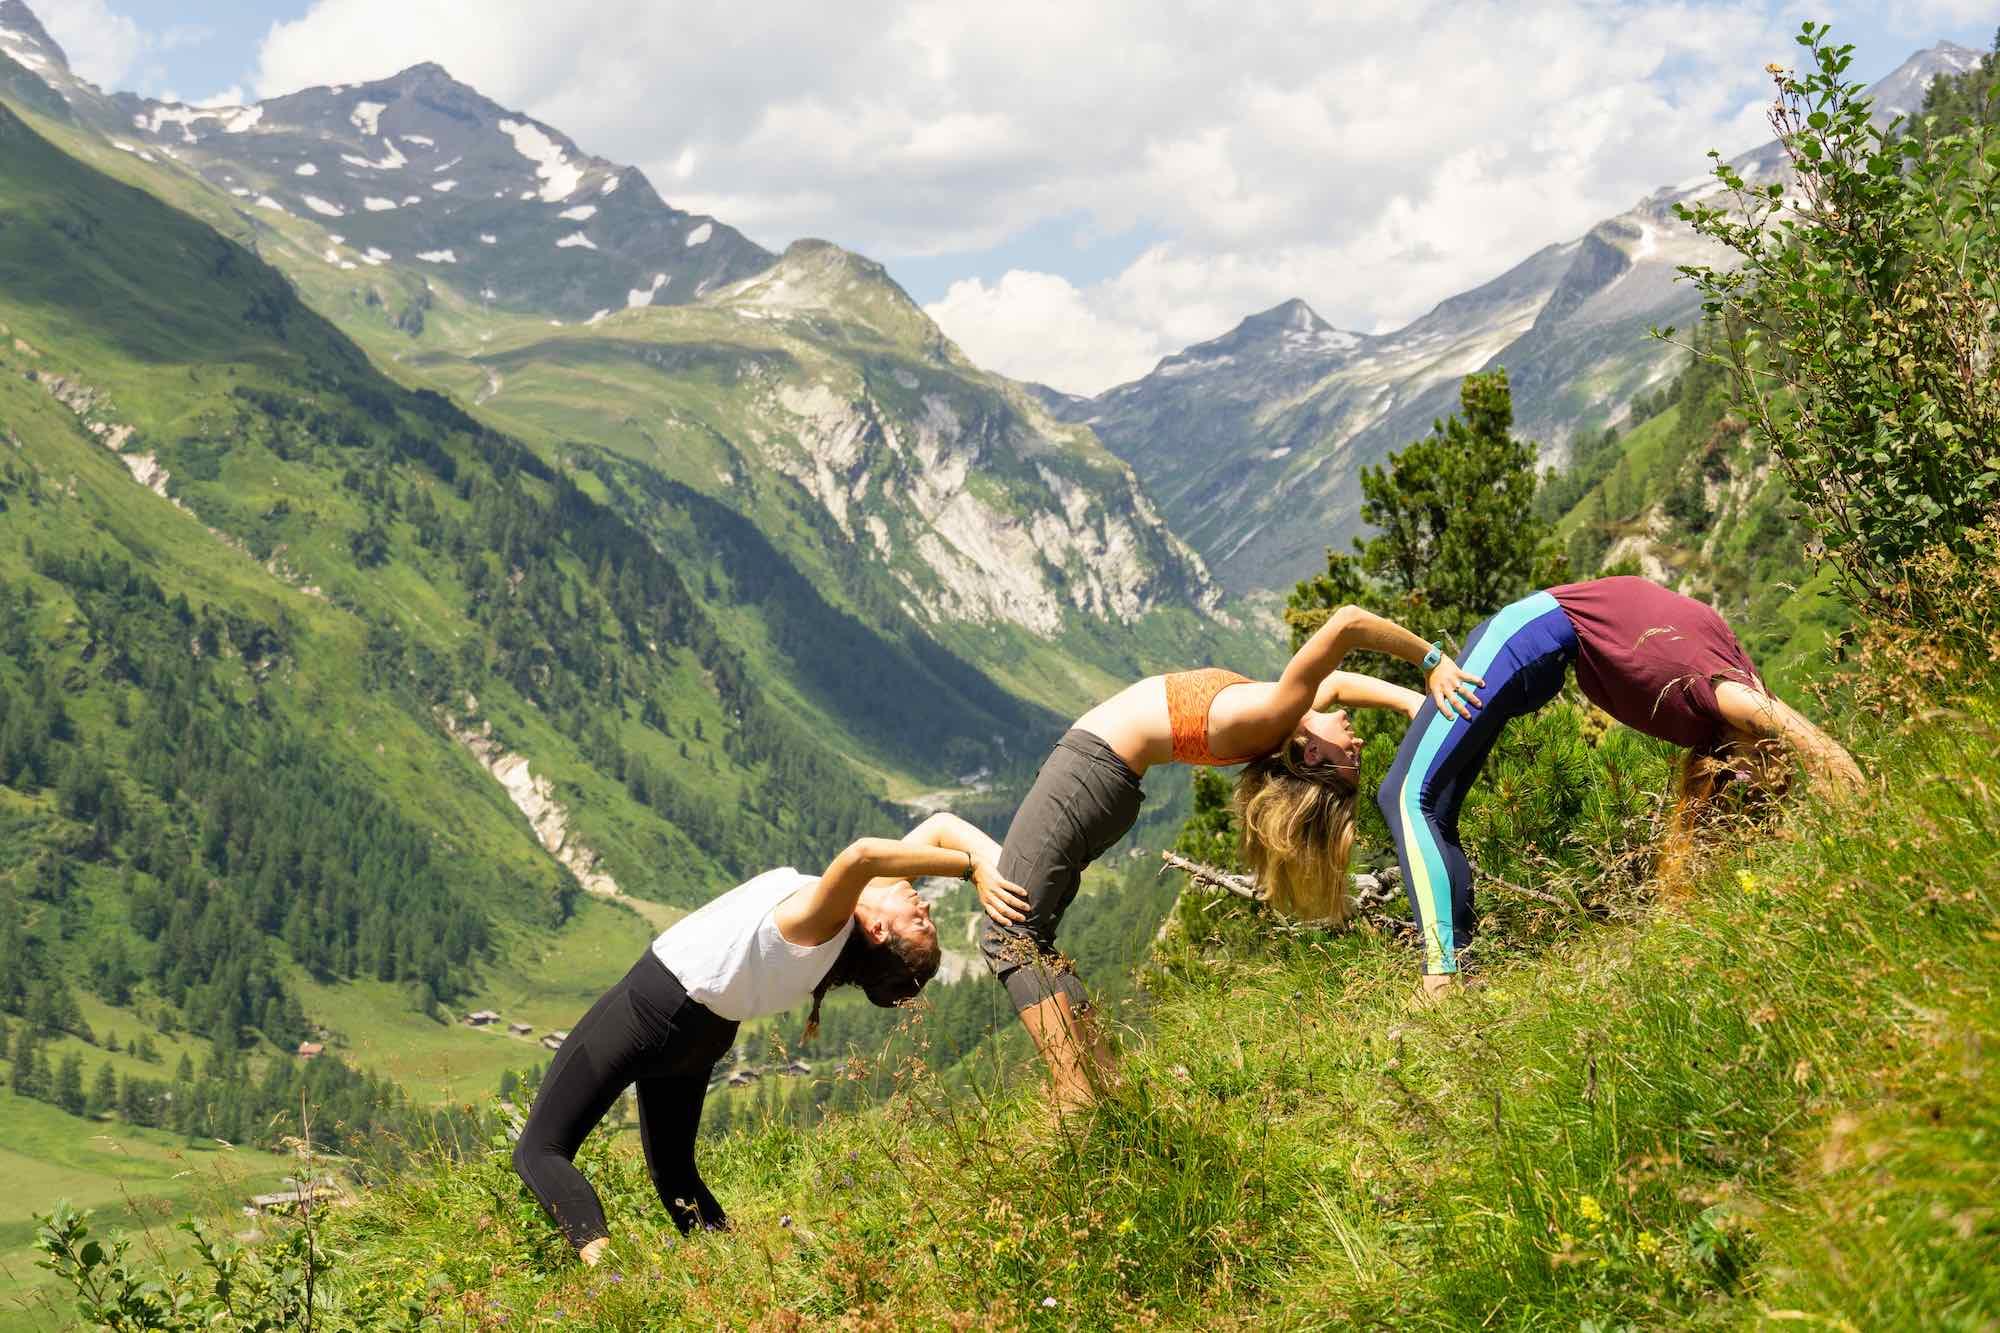 Ashtanga yoga in Austria